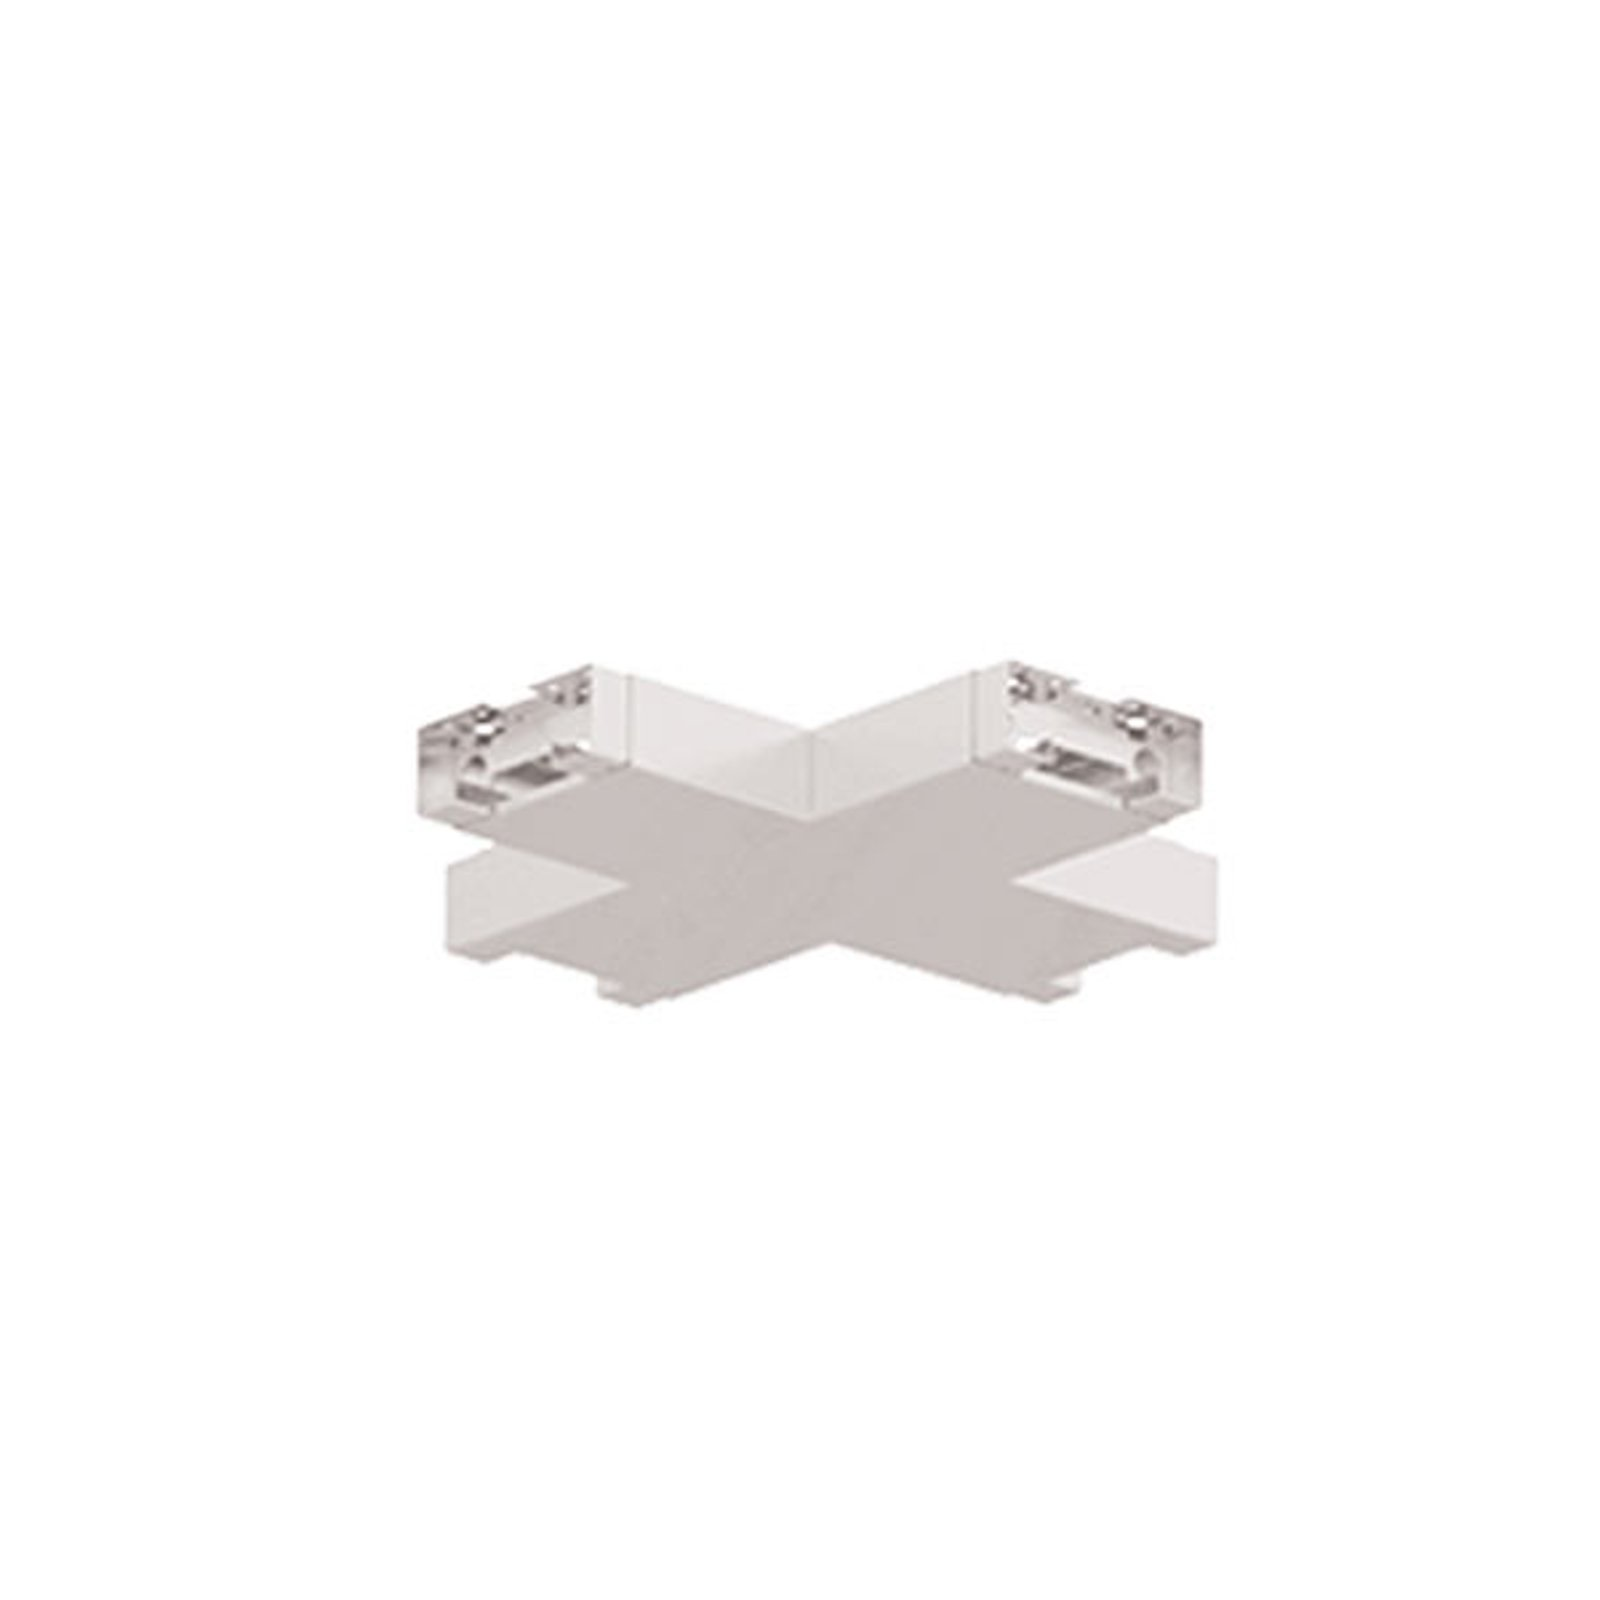 Forbinder Procube-CUVK-2 X90° for DL Procube